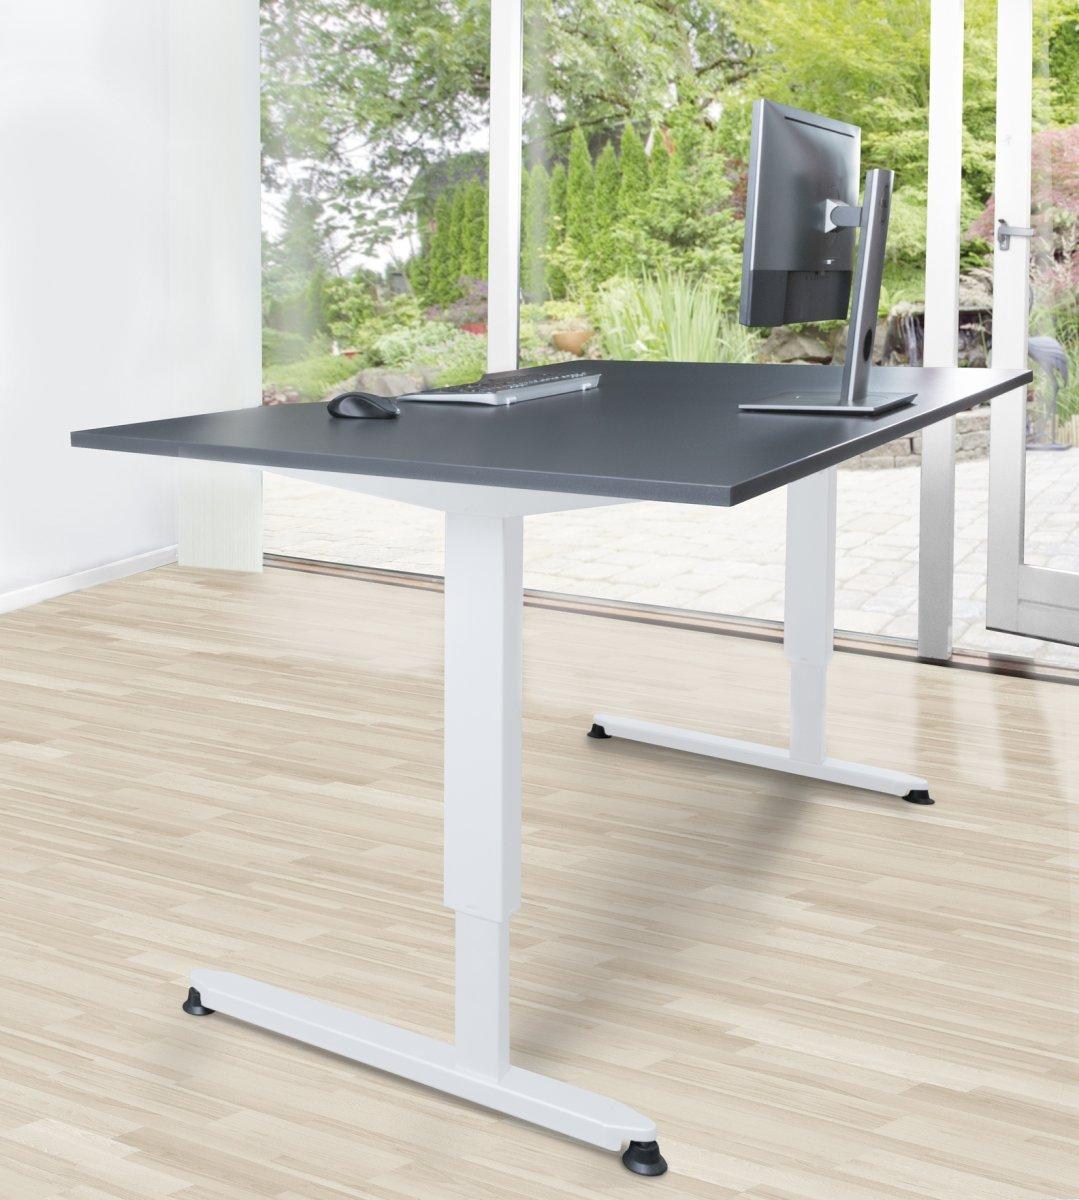 Stay hæve/sænkebord, 180x90 cm, grå/hvid